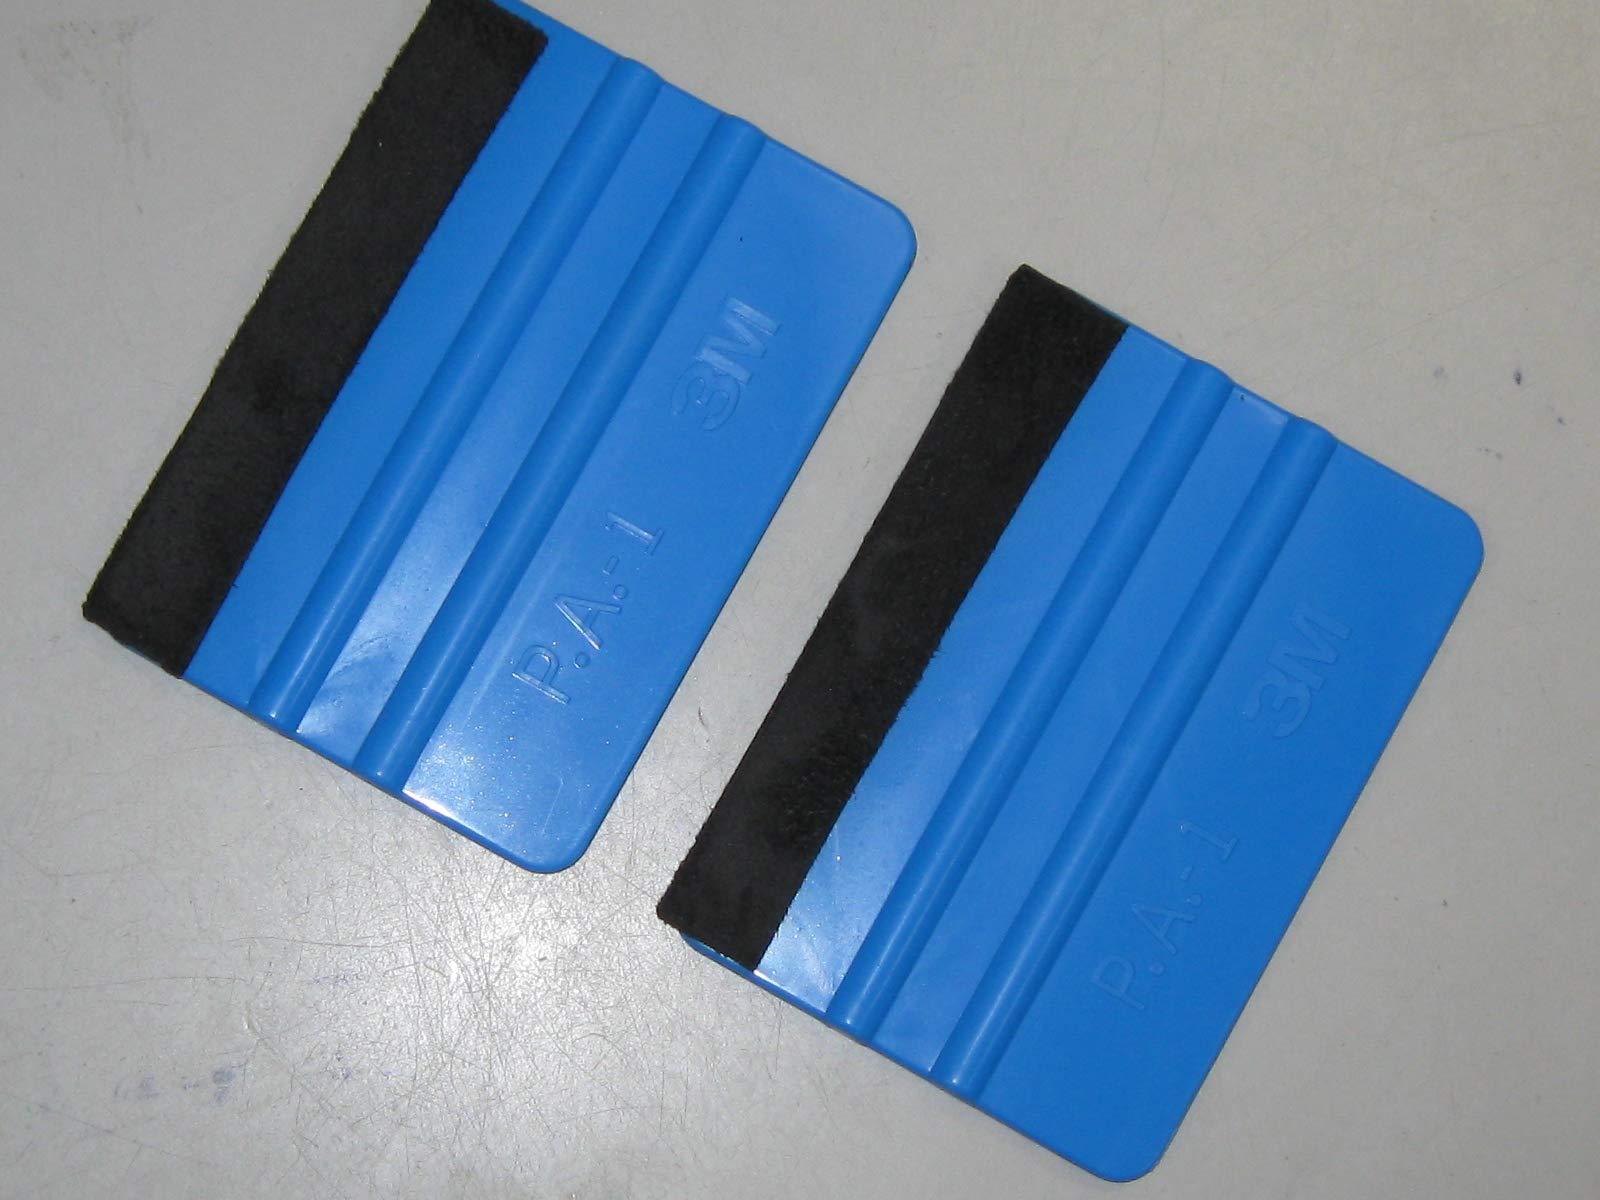 3M Plastic Felt Edge Squeegee 4 inch for Car Vinyl Scraper Decal Applicator Tool (with Black Felt Edge) (2pc)